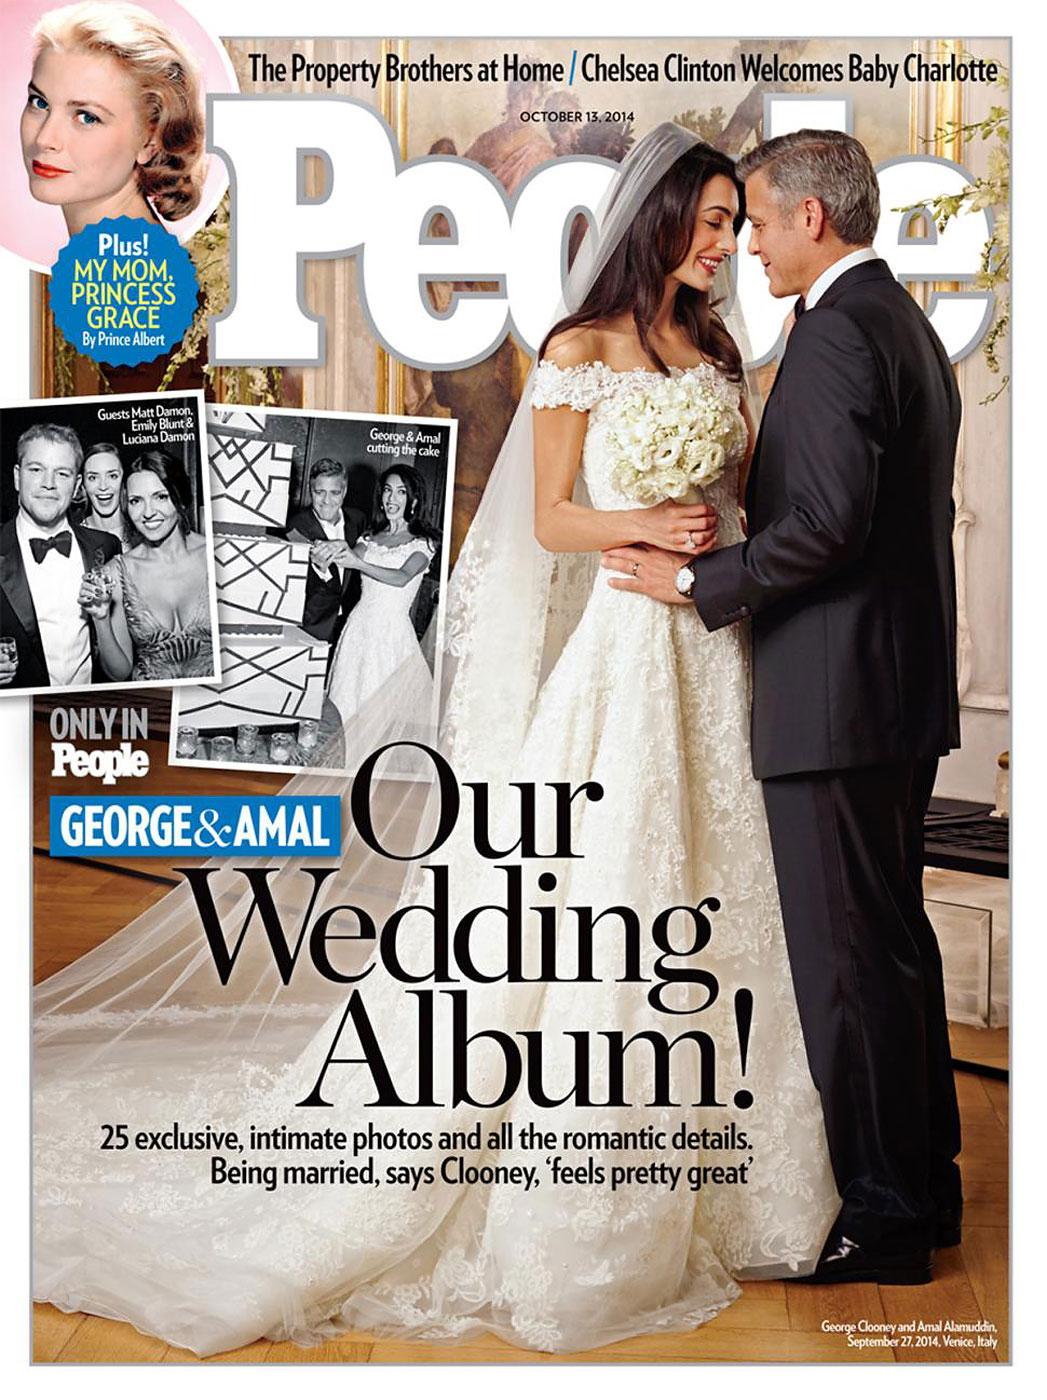 Amal Alamuddin wore an Oscar de la Renta dress for her wedding with George Clooney.